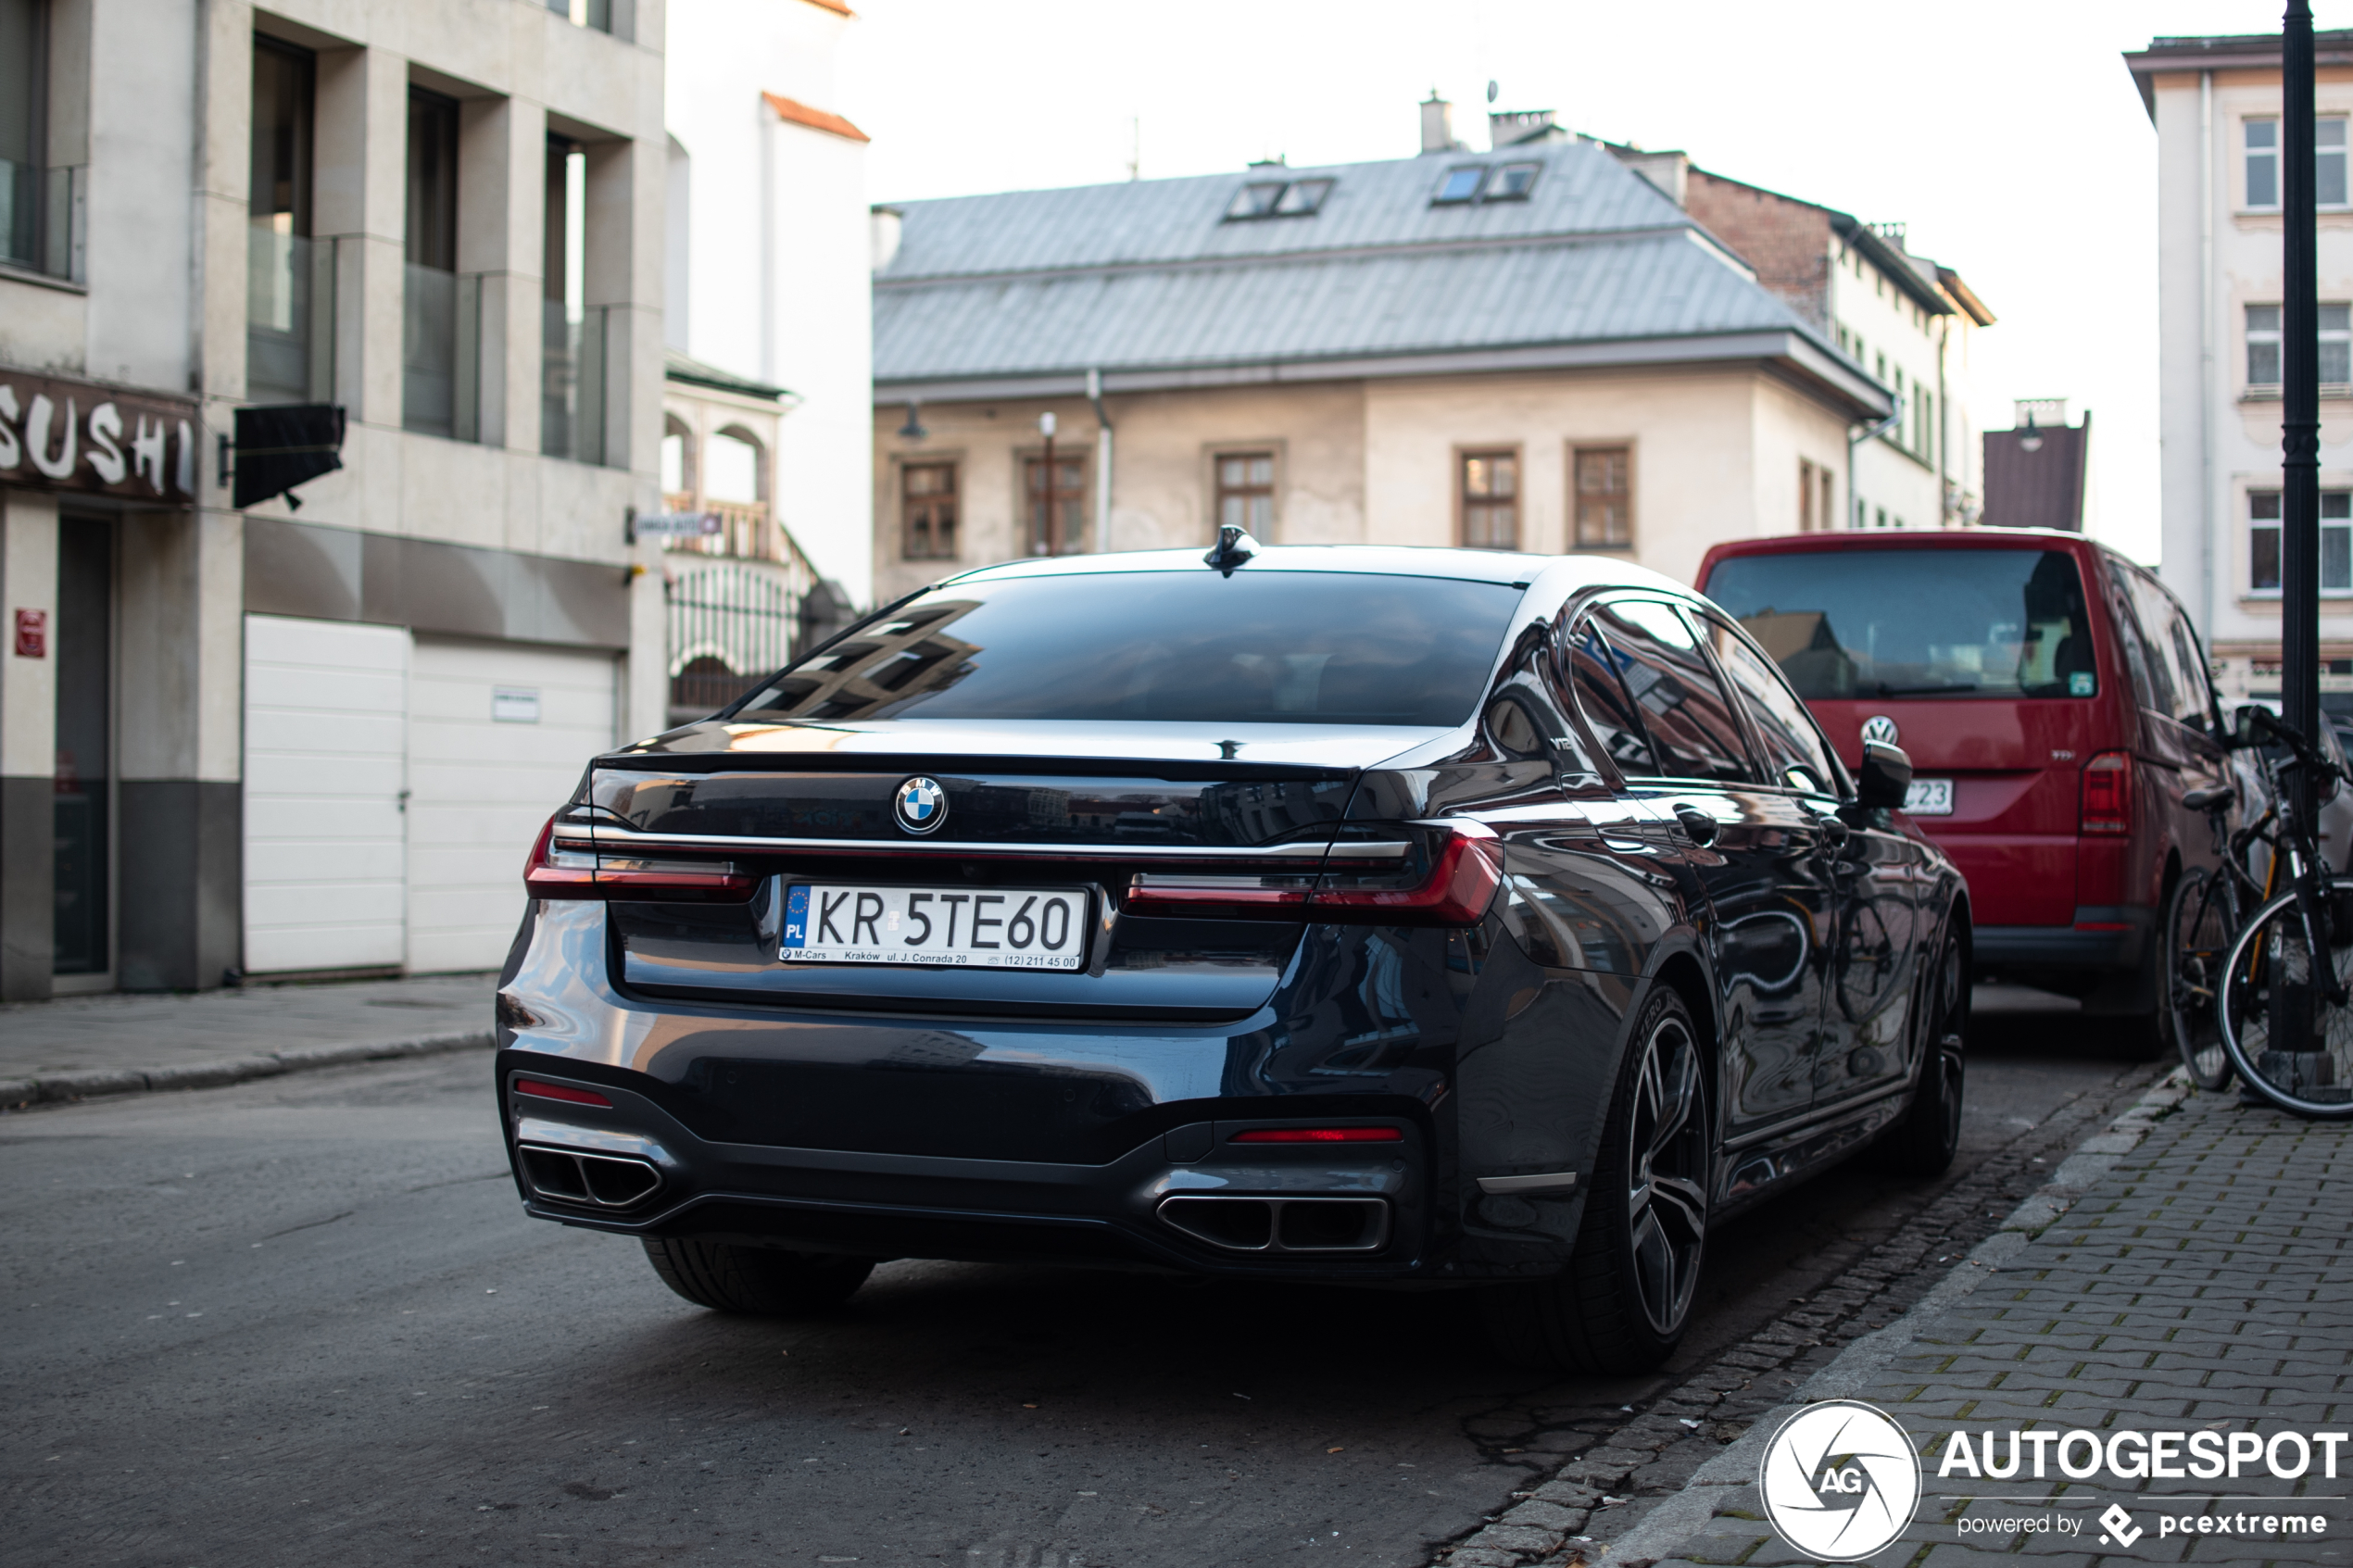 BMW has said goodbye to the V12